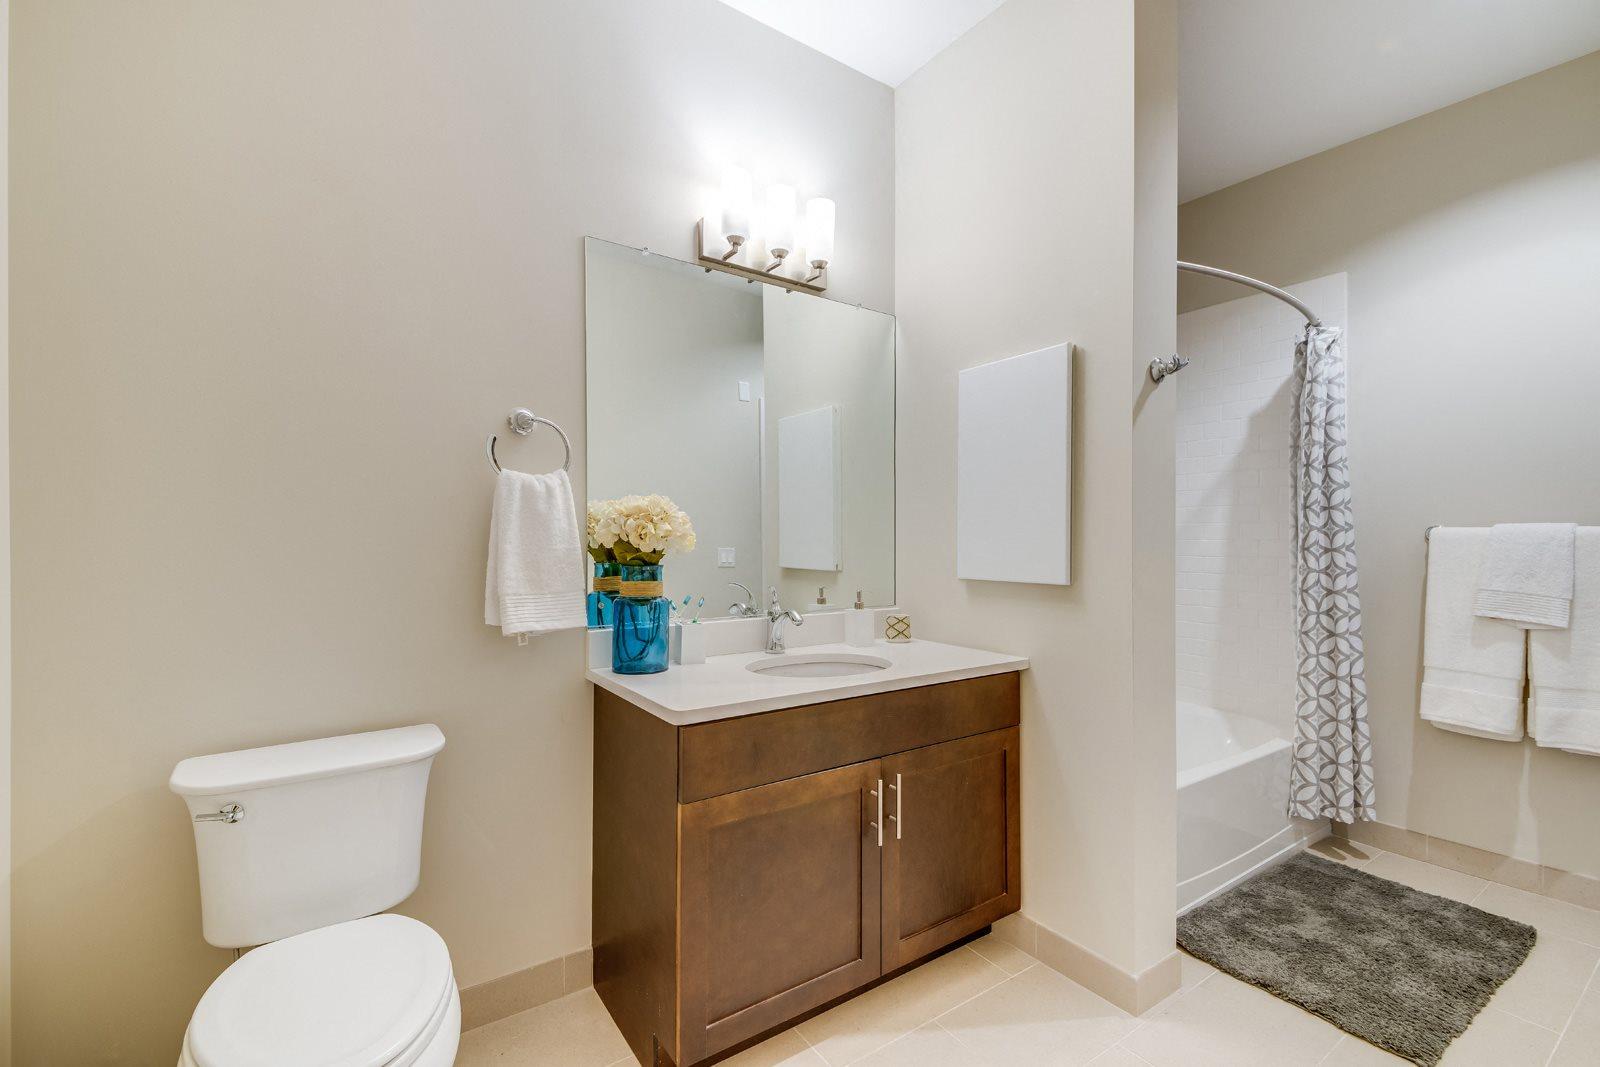 Spacious Bathrooms at Twenty50 by Windsor, 2050 Central Road, NJ